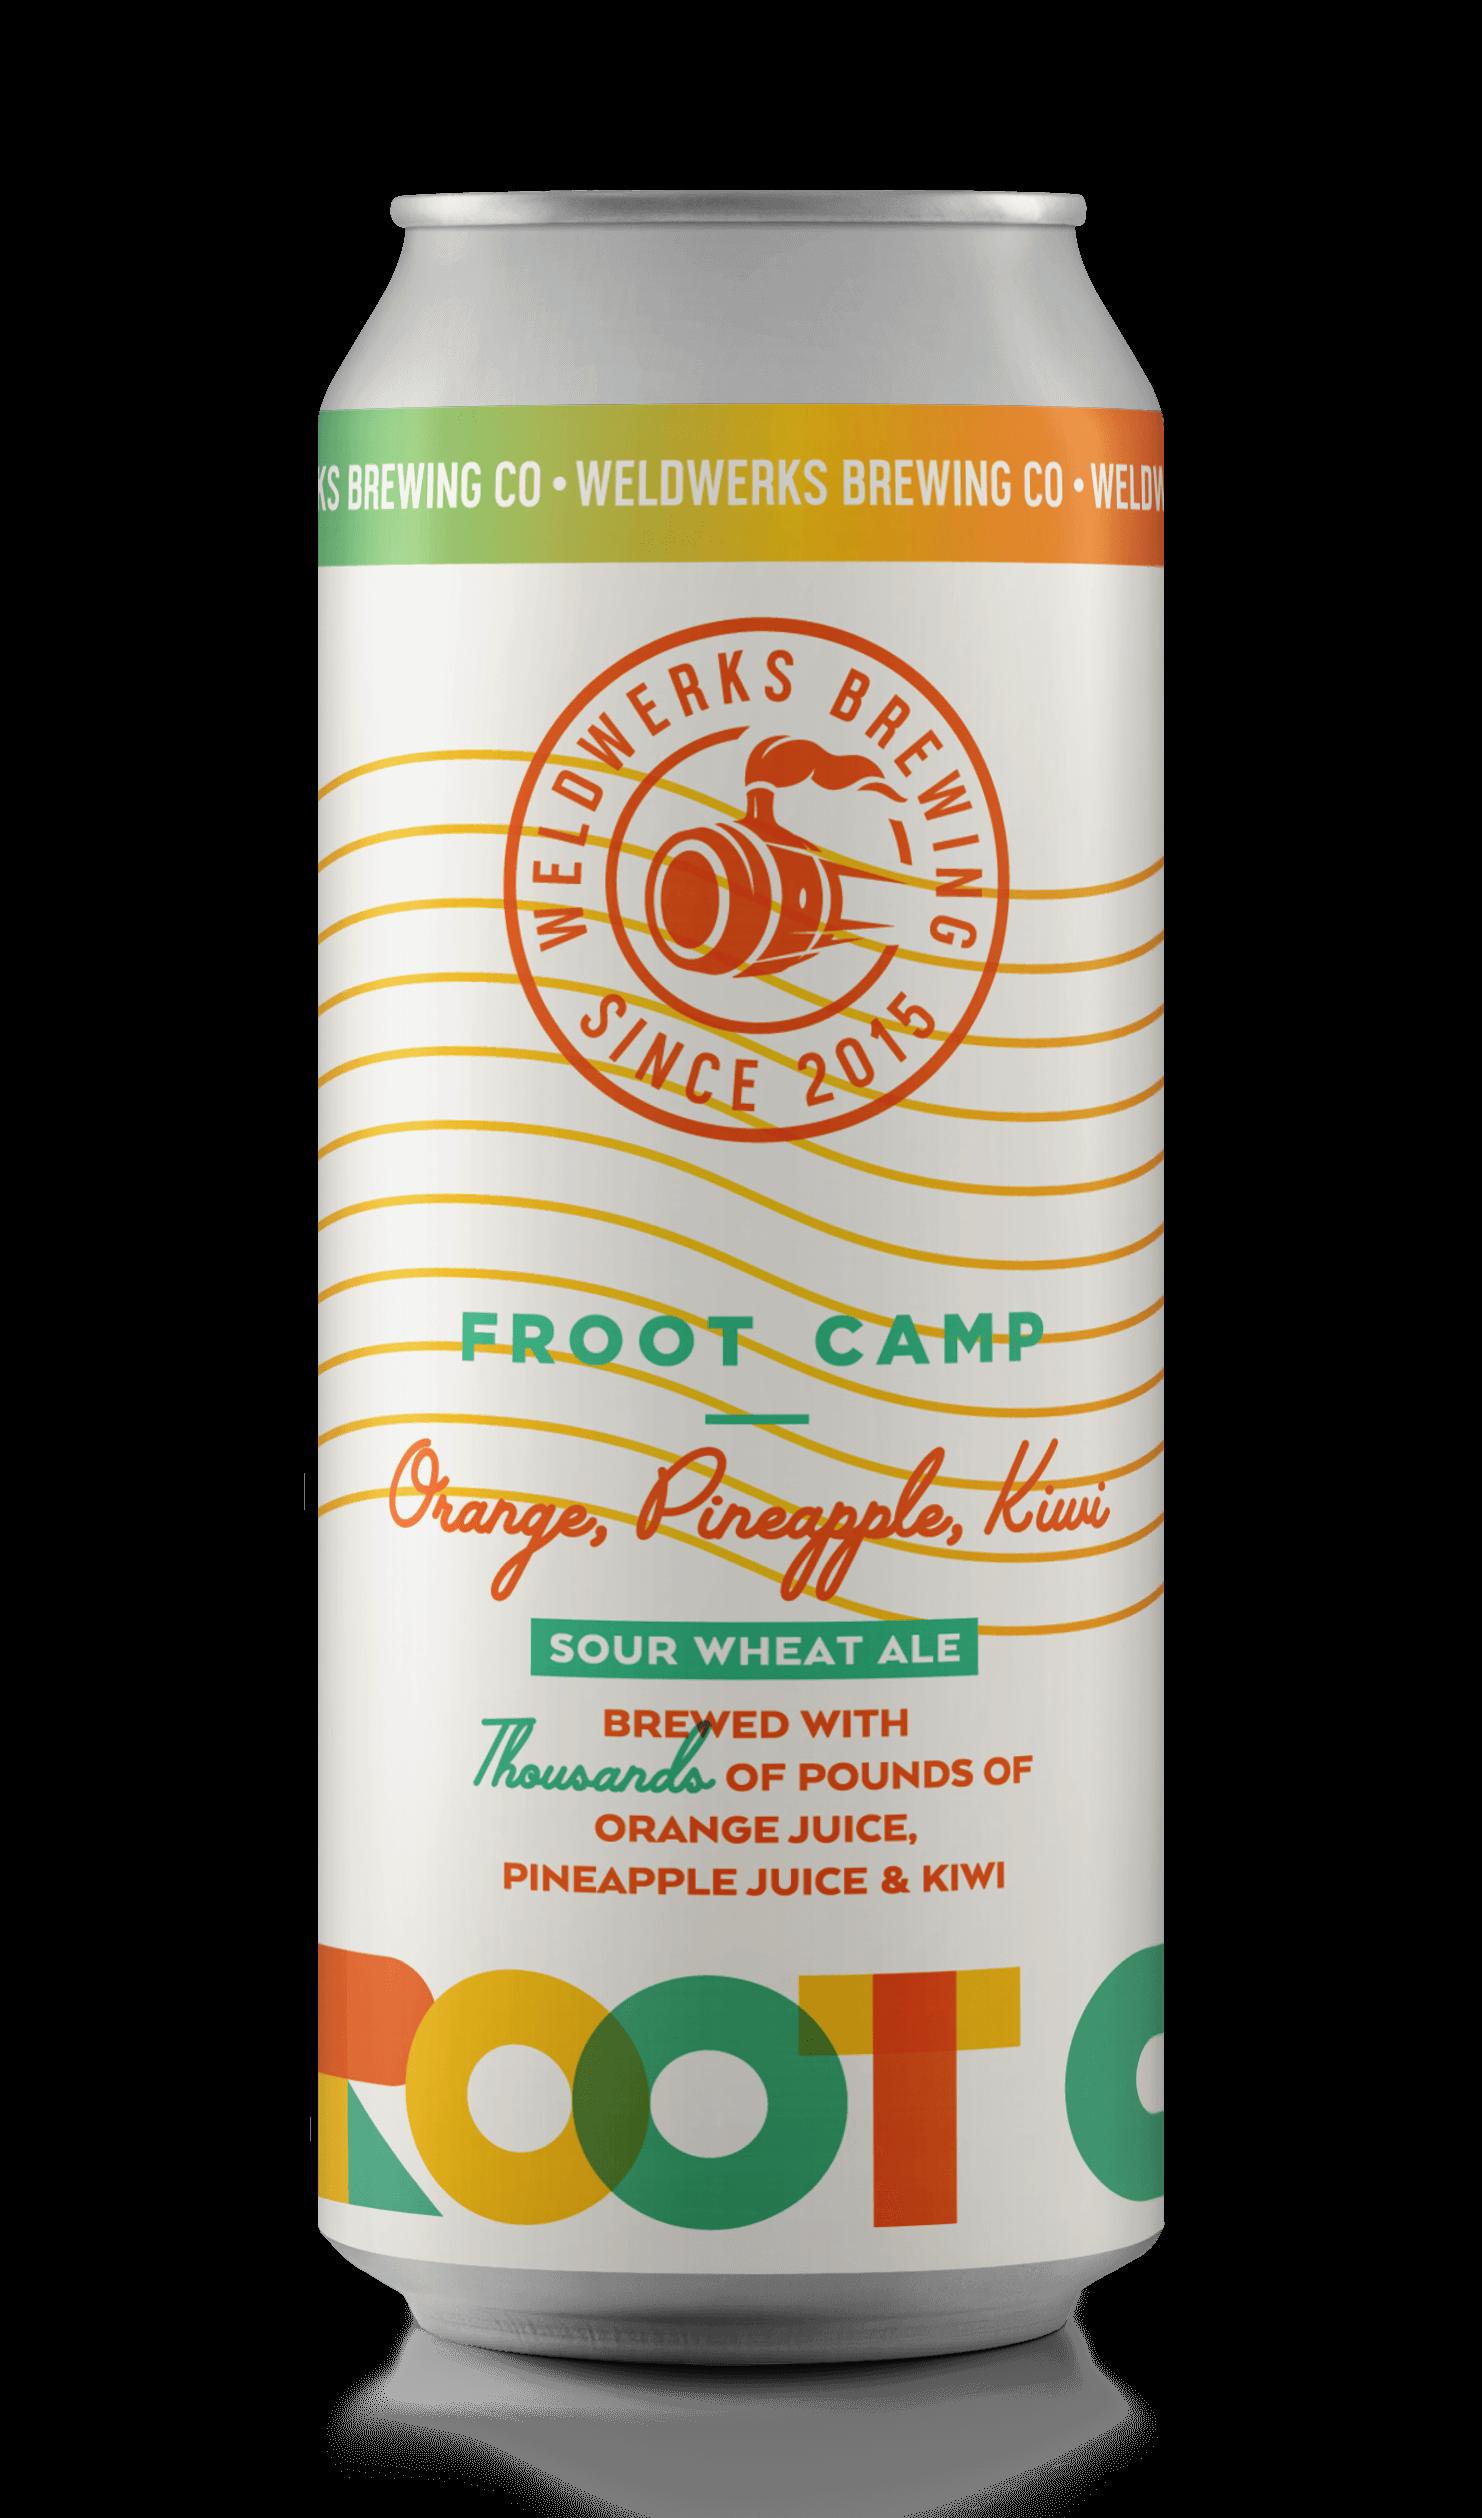 Froot Camp: Orange, Pineapple, Kiwi